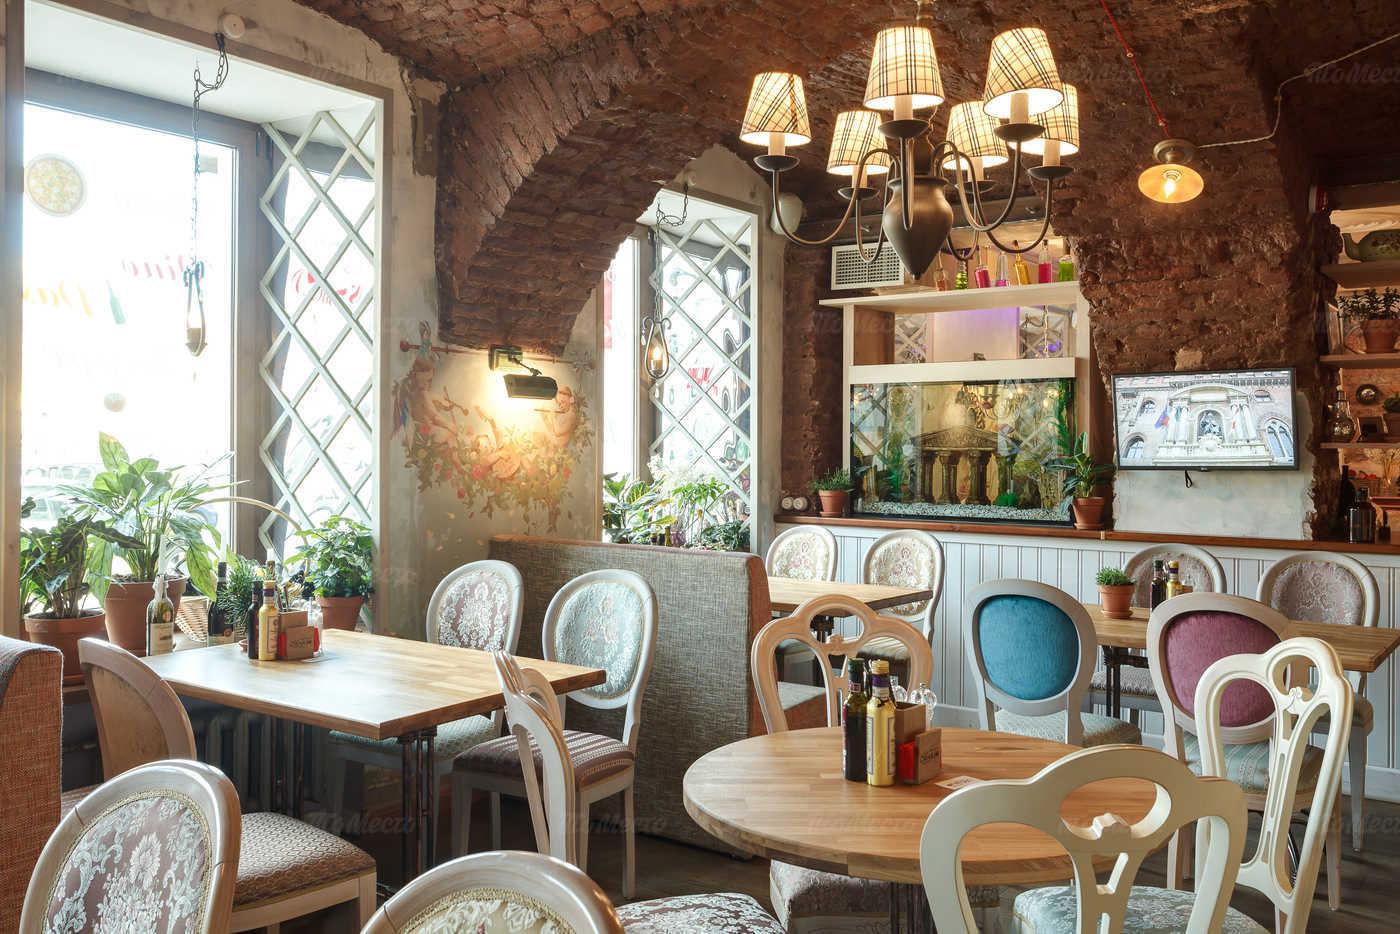 Ресторан Mario Trattoria (Марио Траттория) на Адмиралтейском проспекте